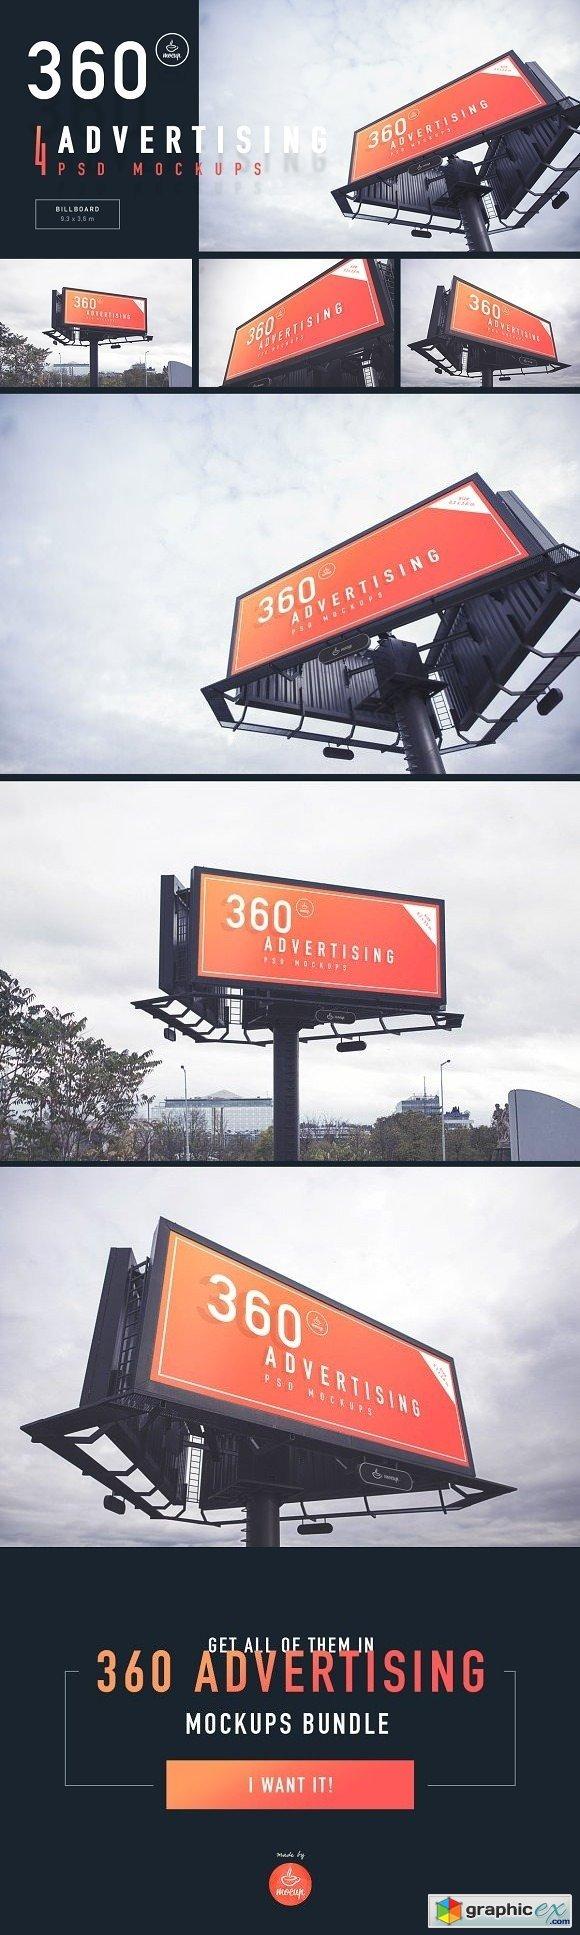 Billboard - 360 Advertising Mockups